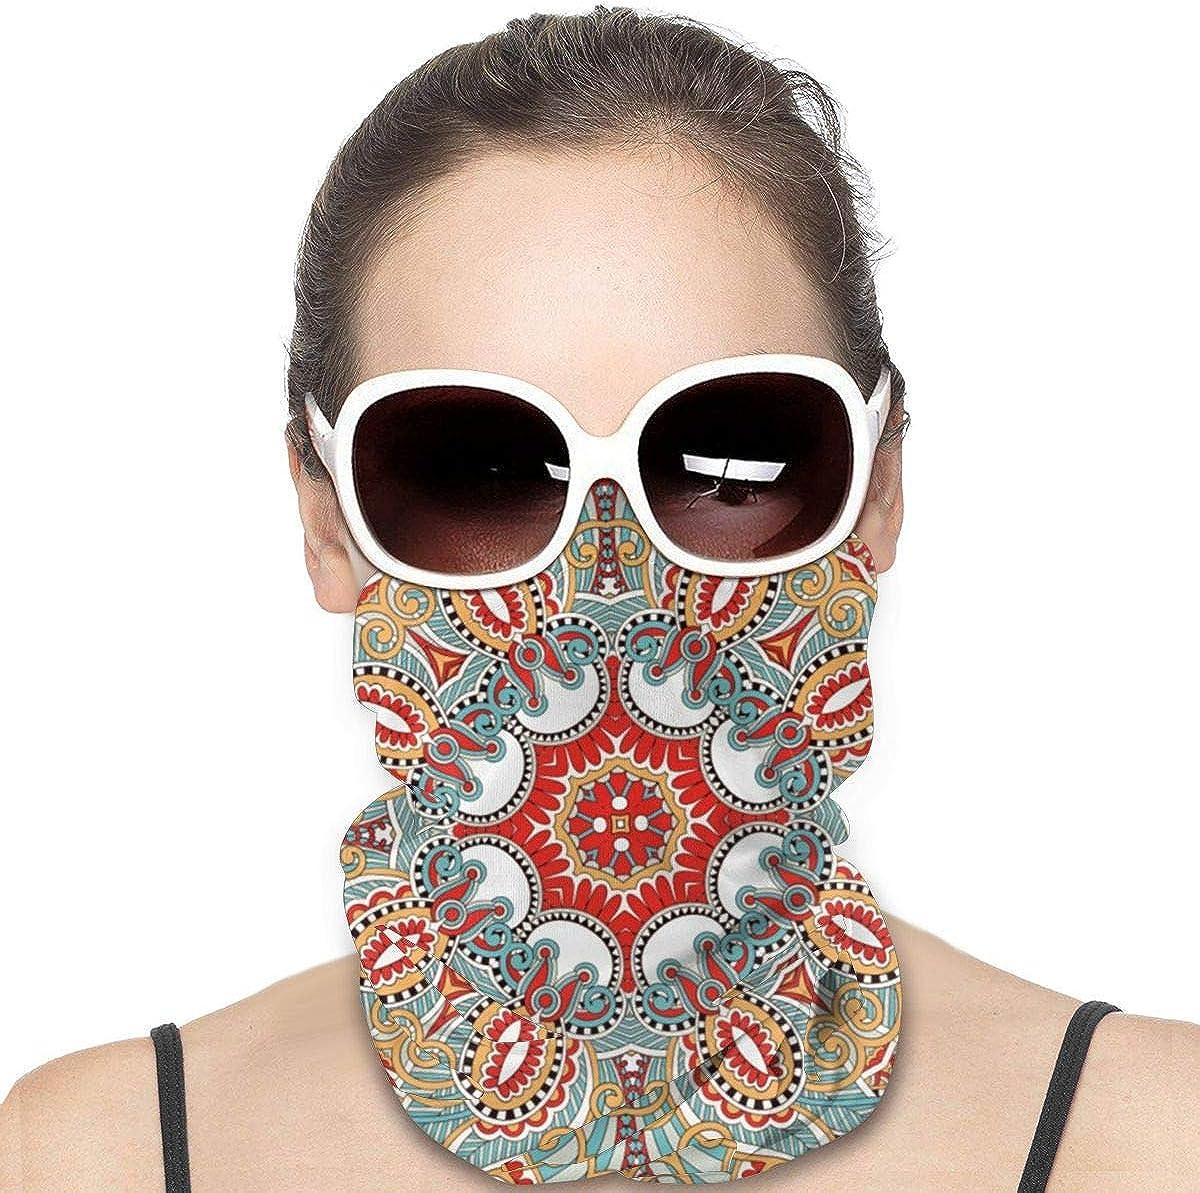 JinSPef Motorcycle Masks for Men - Colorful Cute Chic Retro Red Teal Kaleidoscope Pattern Girlys for Men Neck Gaiter Head Bands Neck Warmer Men Headscarf Sun Mask